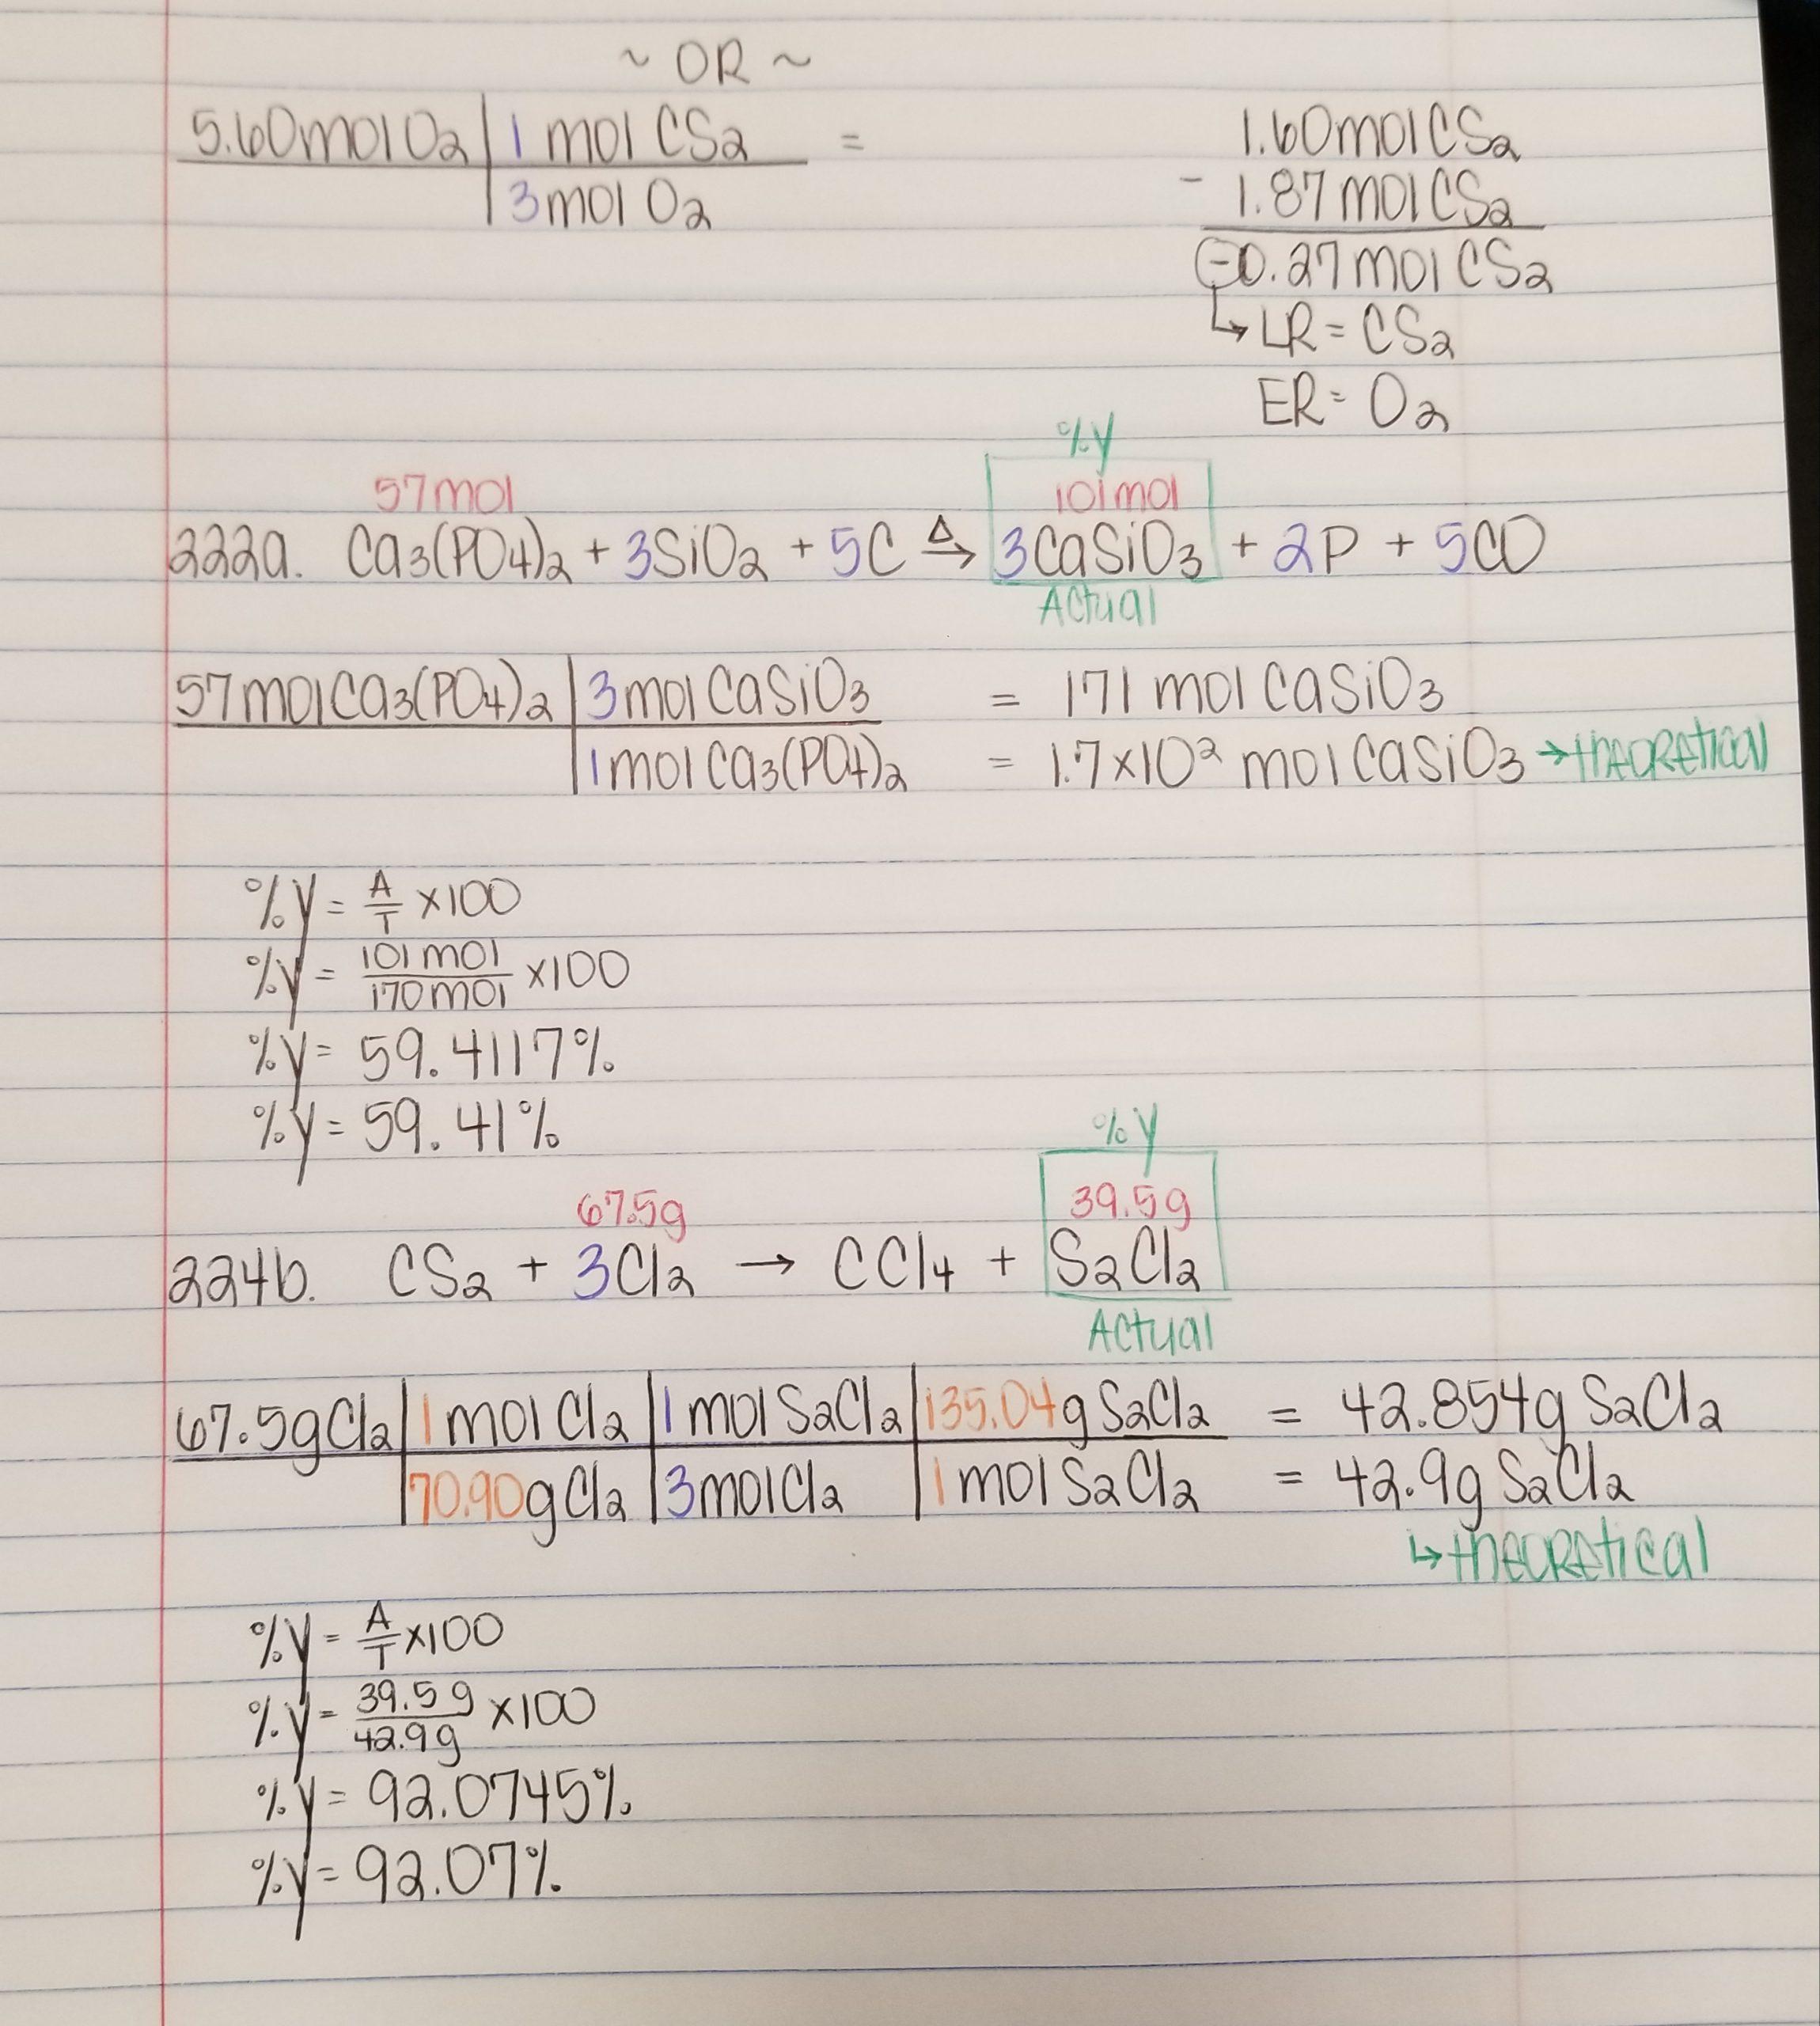 30 Nomenclature Worksheet 1 Monatomic Ions